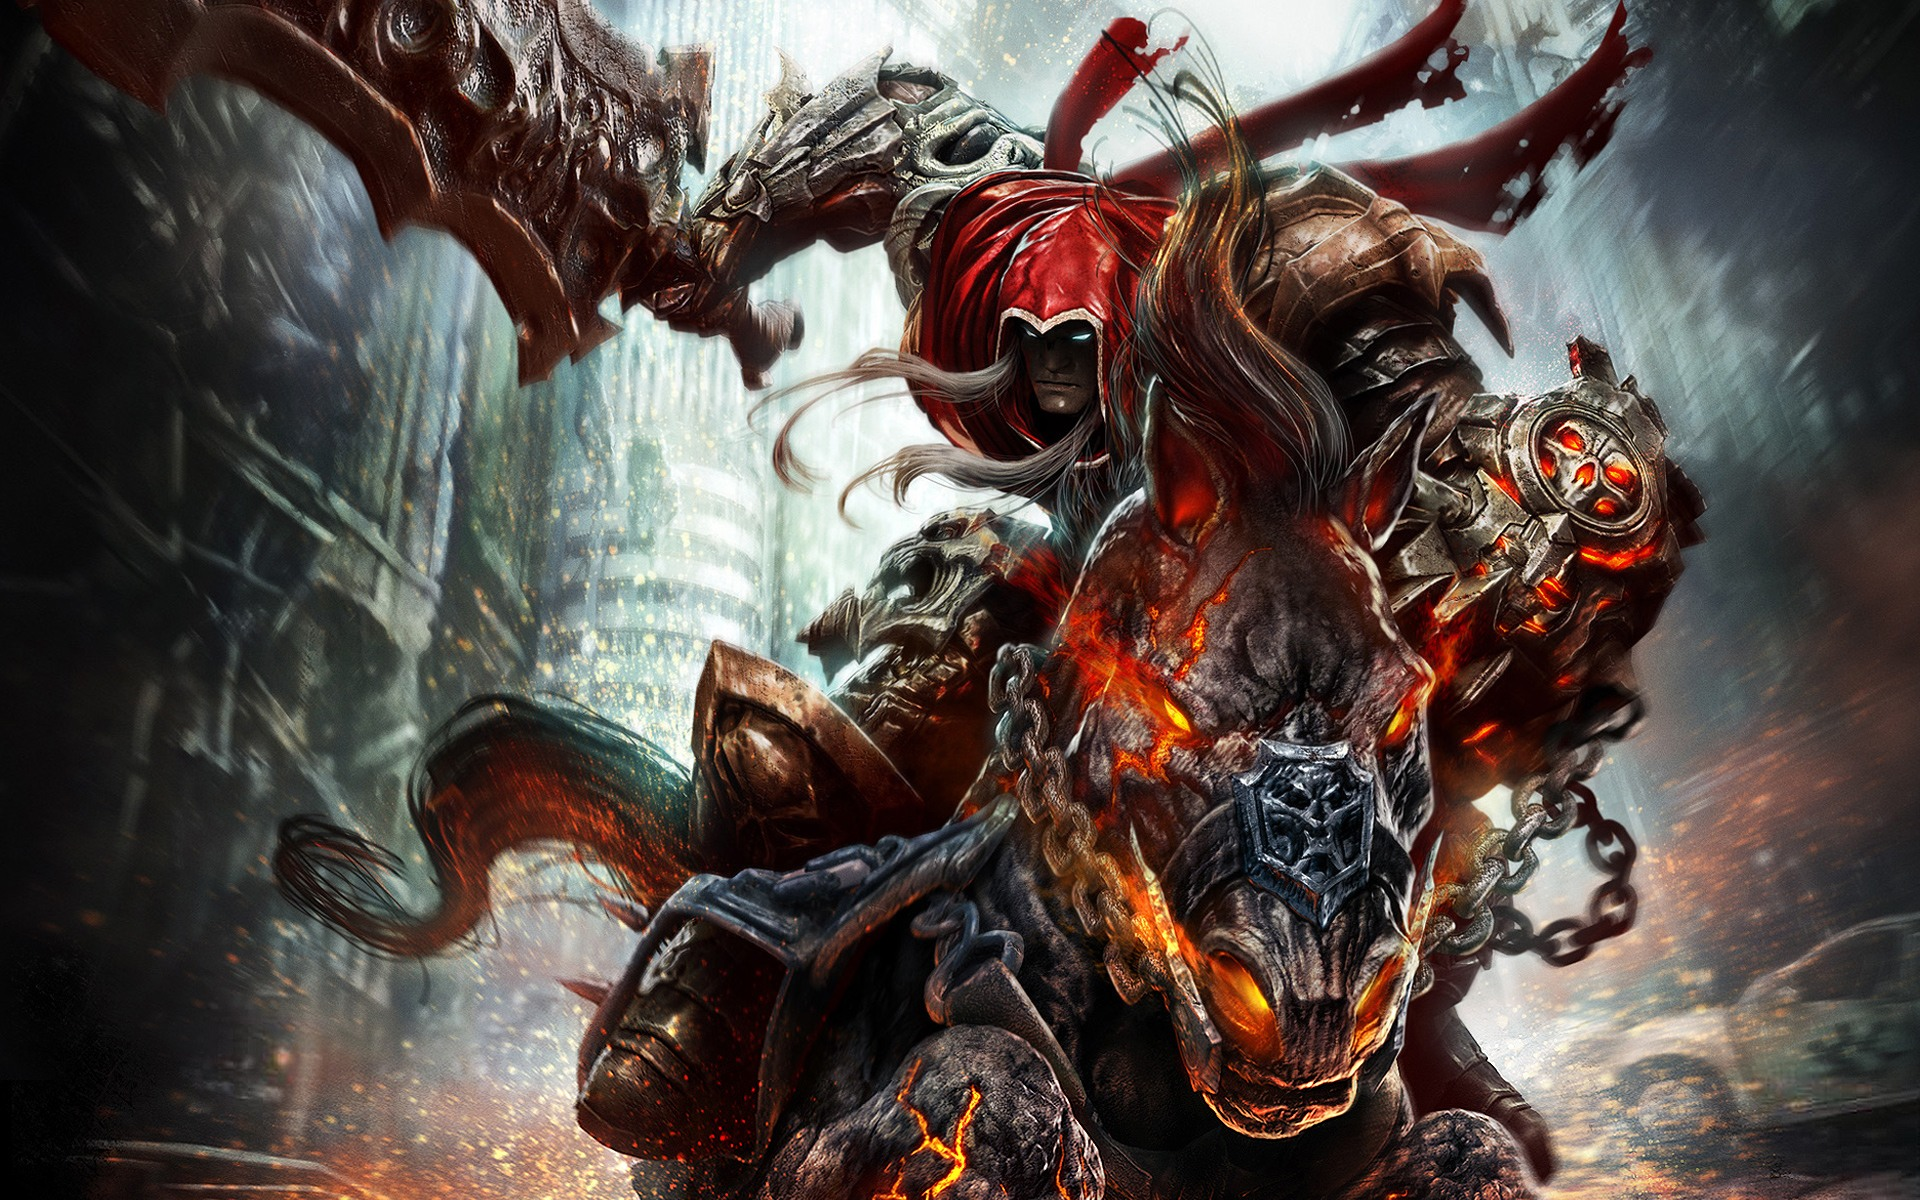 Darksiders premier du nom, bientot en version remaster